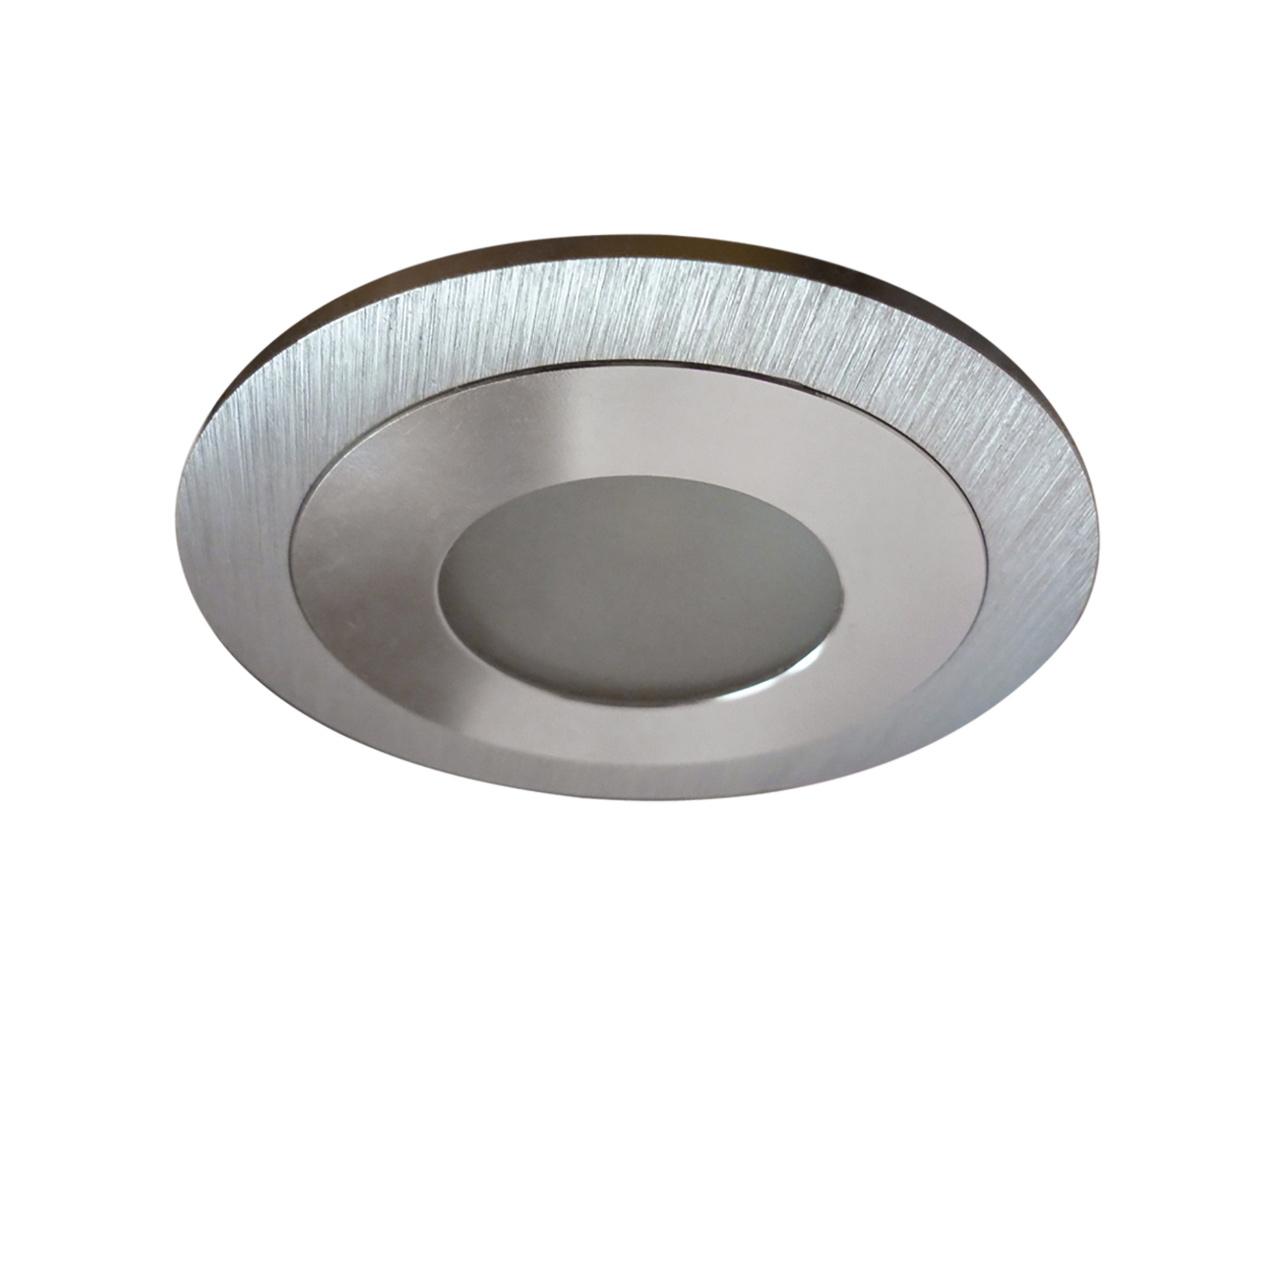 Светильник Leddy cyl LED 3W 240LM алюминий 3000K в стену в подрозетник с трансф Lightstar 212170